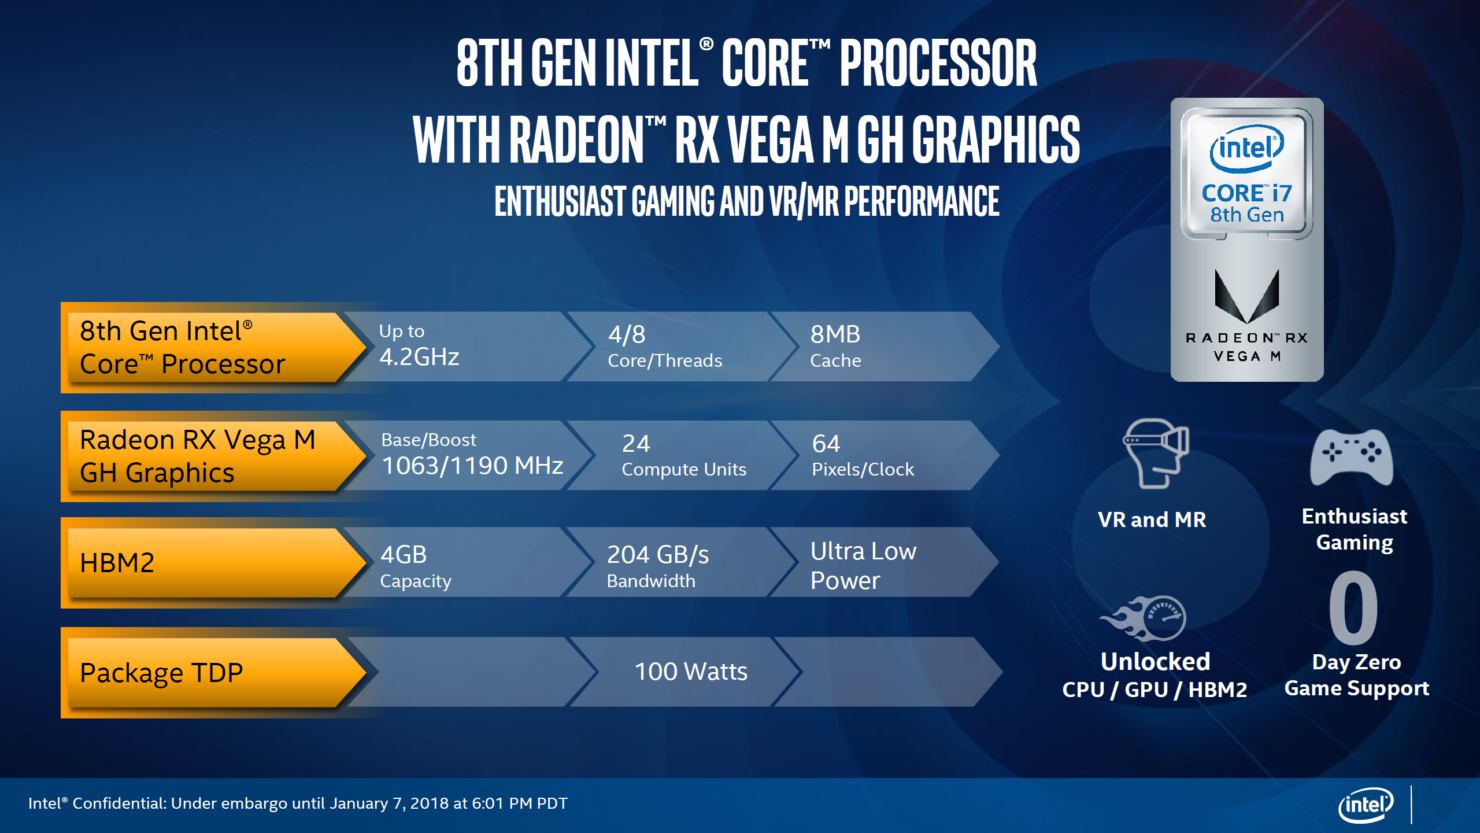 intel-8th-generation-core-processors-with-amd-radeon-rx-vega-m-graphics_18